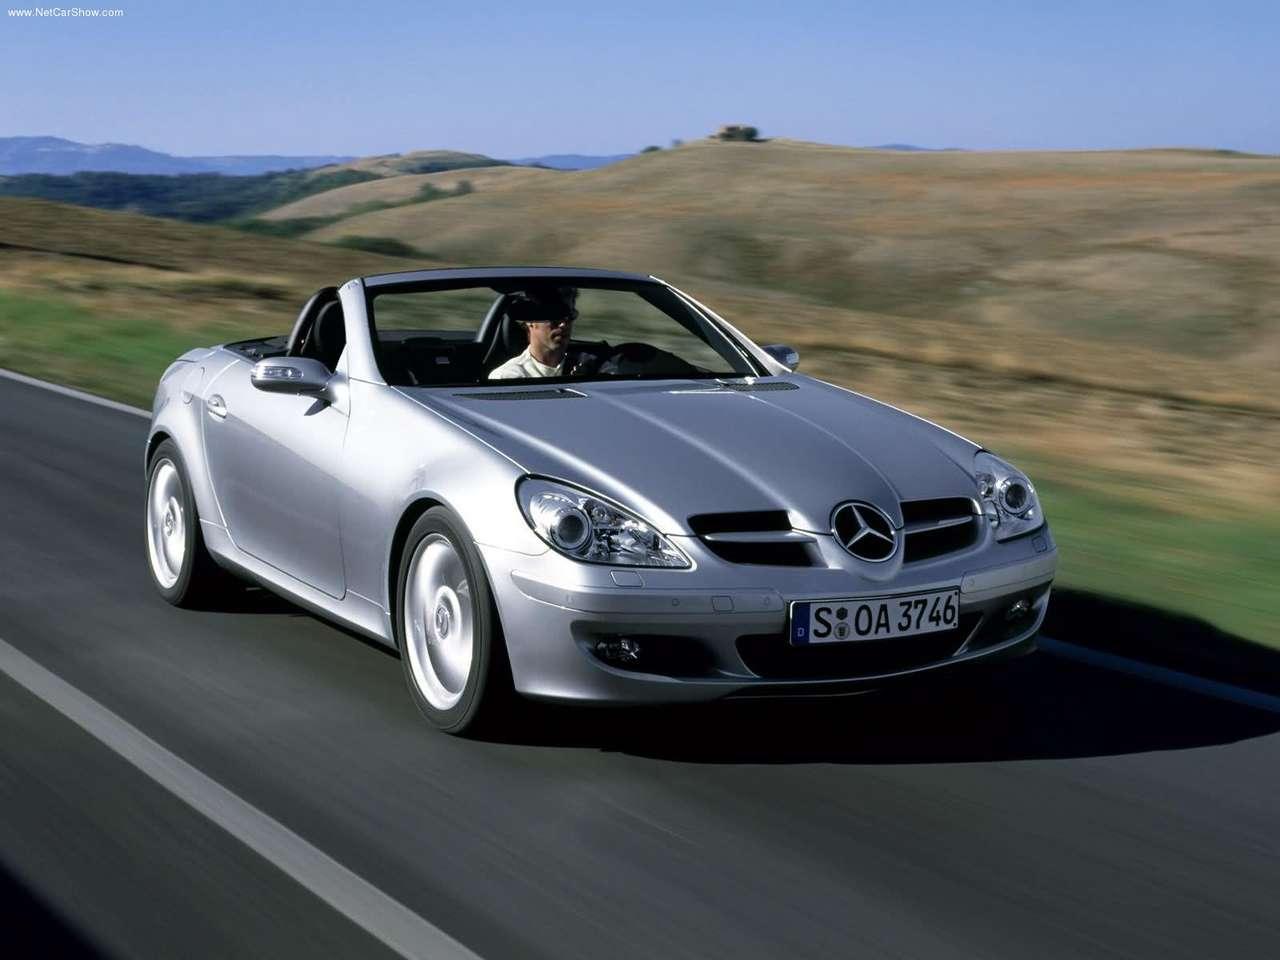 http://2.bp.blogspot.com/-gl-eOL3aXMc/TlFp0TM1Y0I/AAAAAAAAAUY/z6BNAUXD784/s1600/Mercedes-Benz-SLK350_2005_1280x960_wallpaper_08.jpg